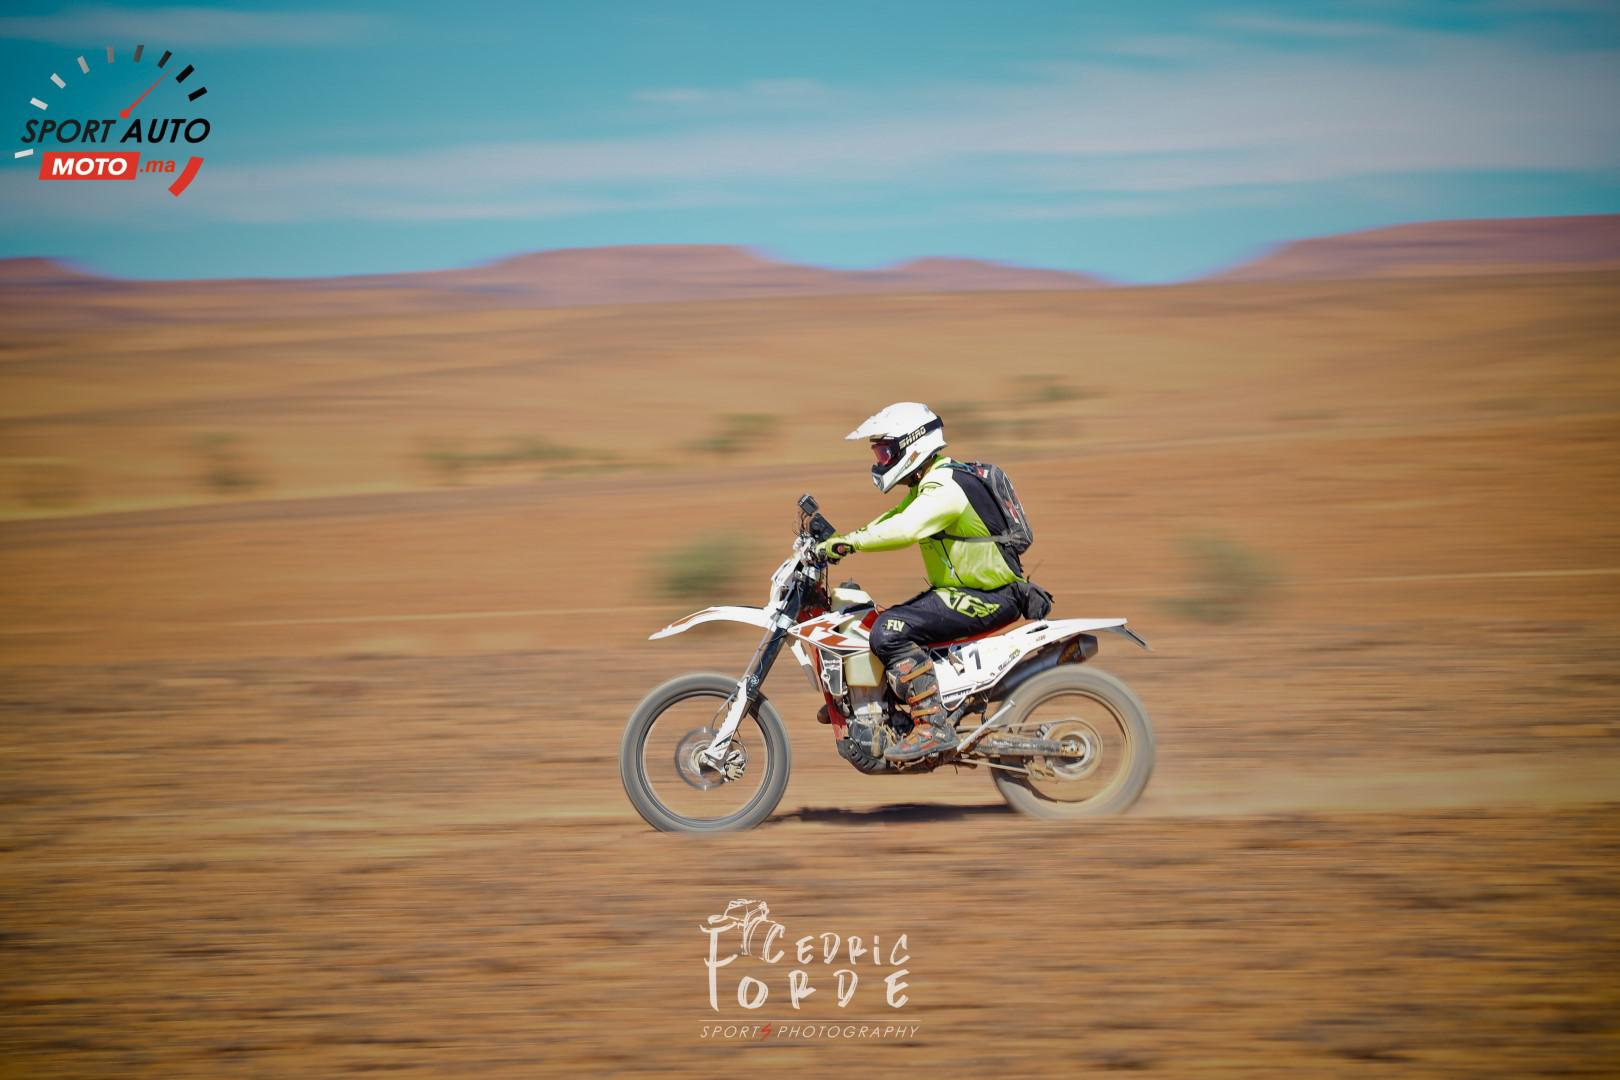 hearts-of-morocco-2018-besson-et-ivan-remportent-l-etape-3-etape-4-annulee-894-4.jpg